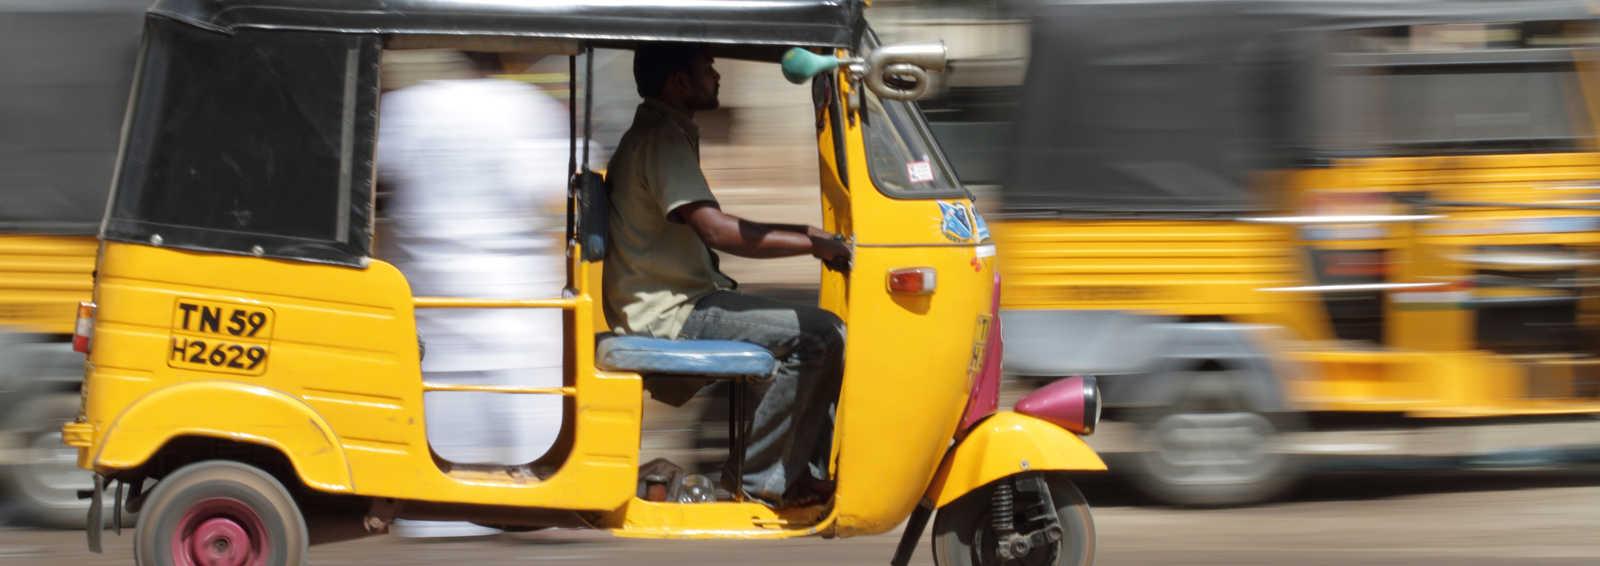 Auto Rickshaw (tuk tuk), India